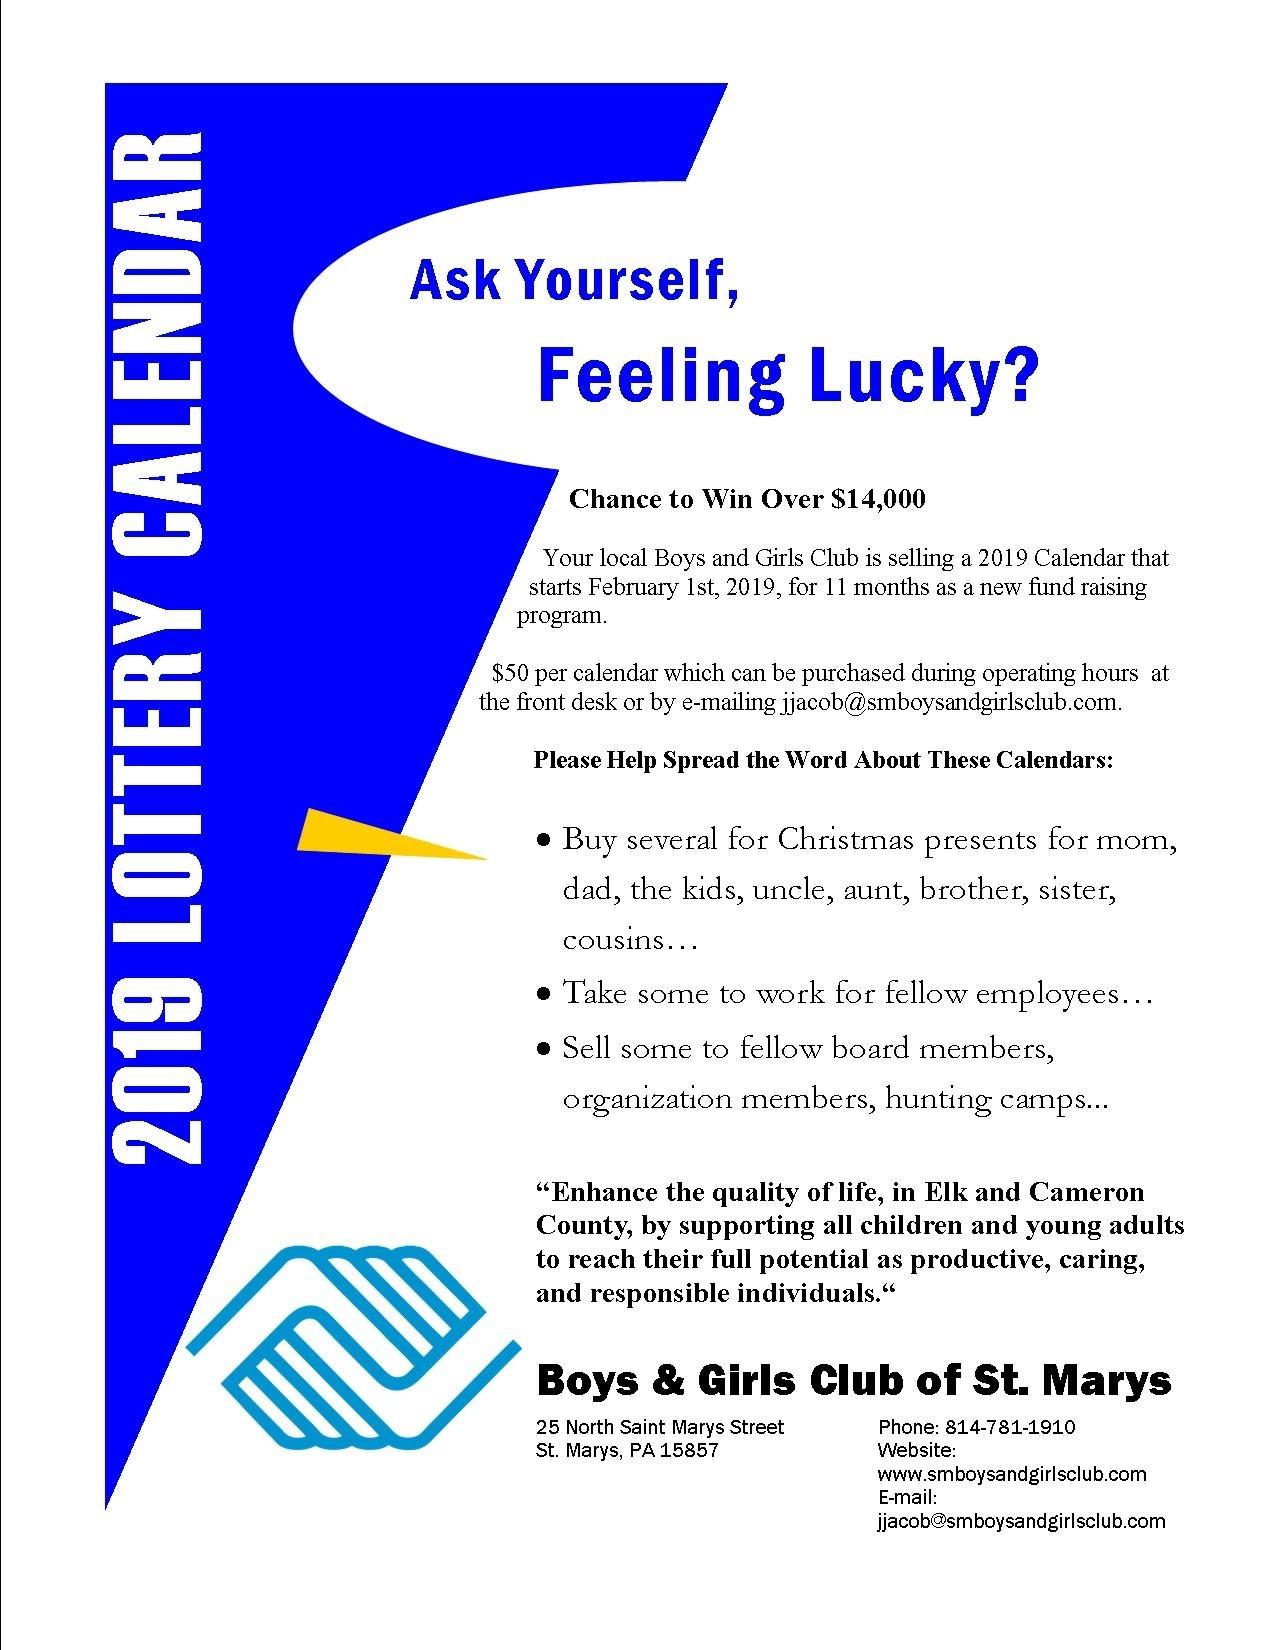 2019 Lottery Calendar Fundraiser – Boys & Girls Club Of St